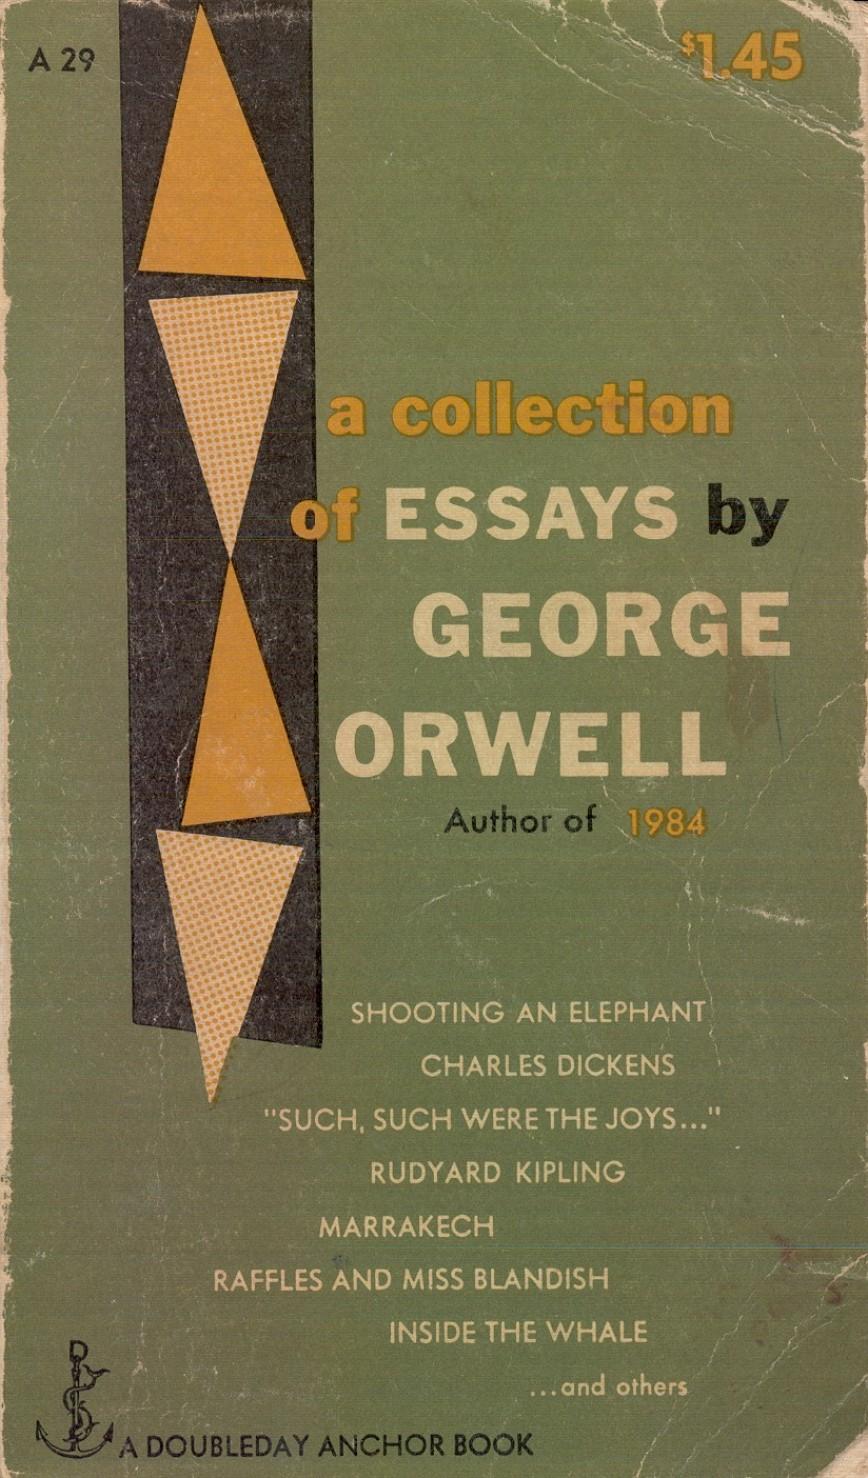 019 Essay Example Orwell George Frightening Essays Critical Pdf Bookshop